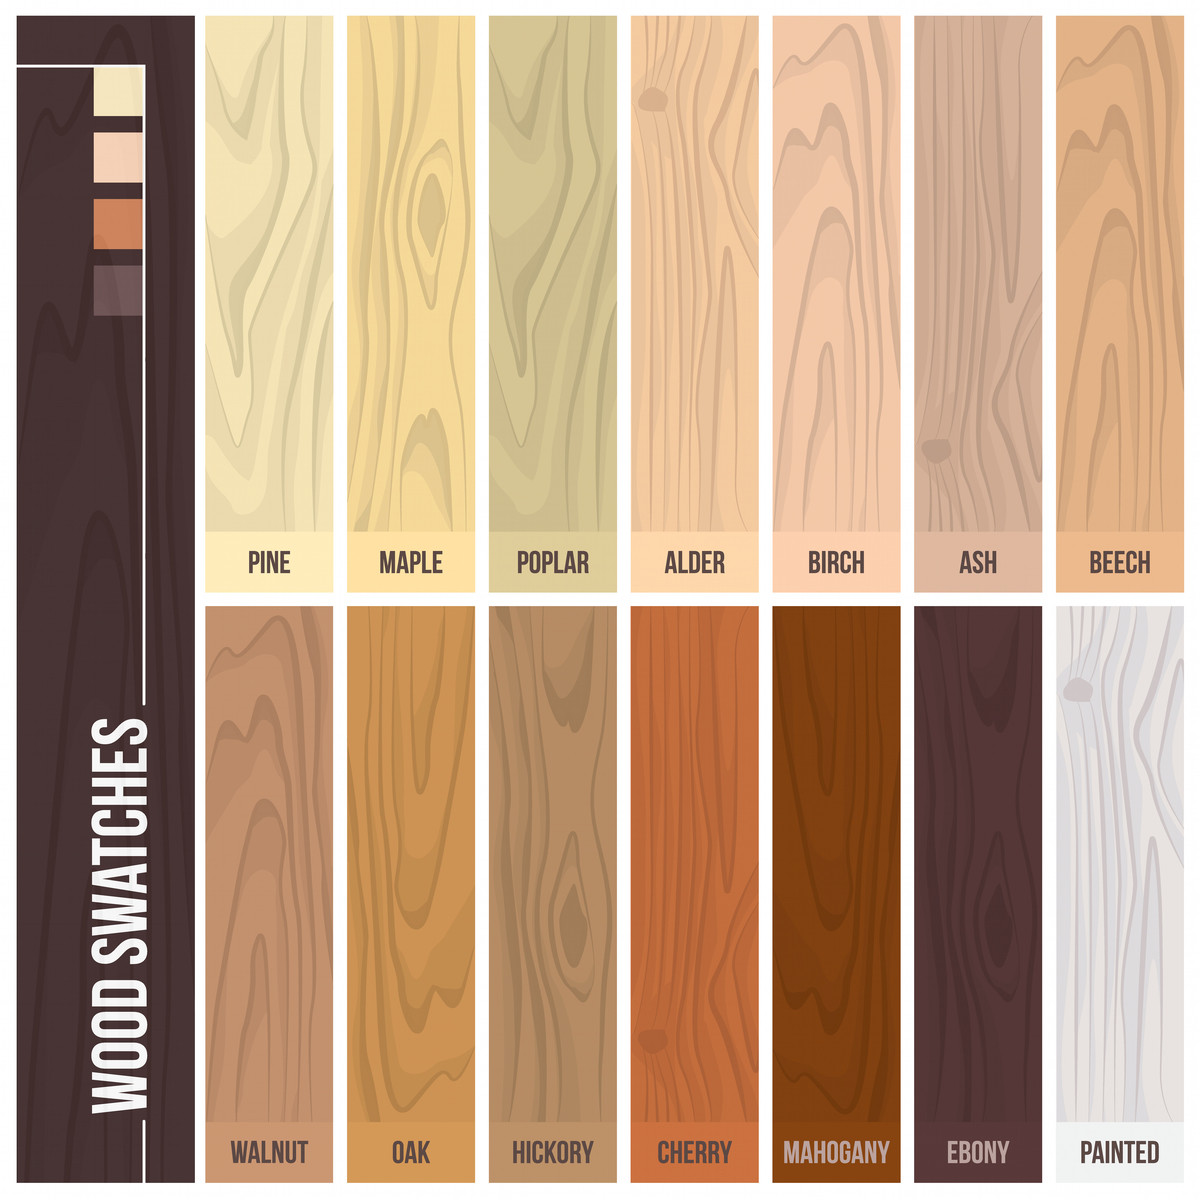 1 2 solid hardwood flooring of 12 types of hardwood flooring species styles edging dimensions with types of hardwood flooring illustrated guide